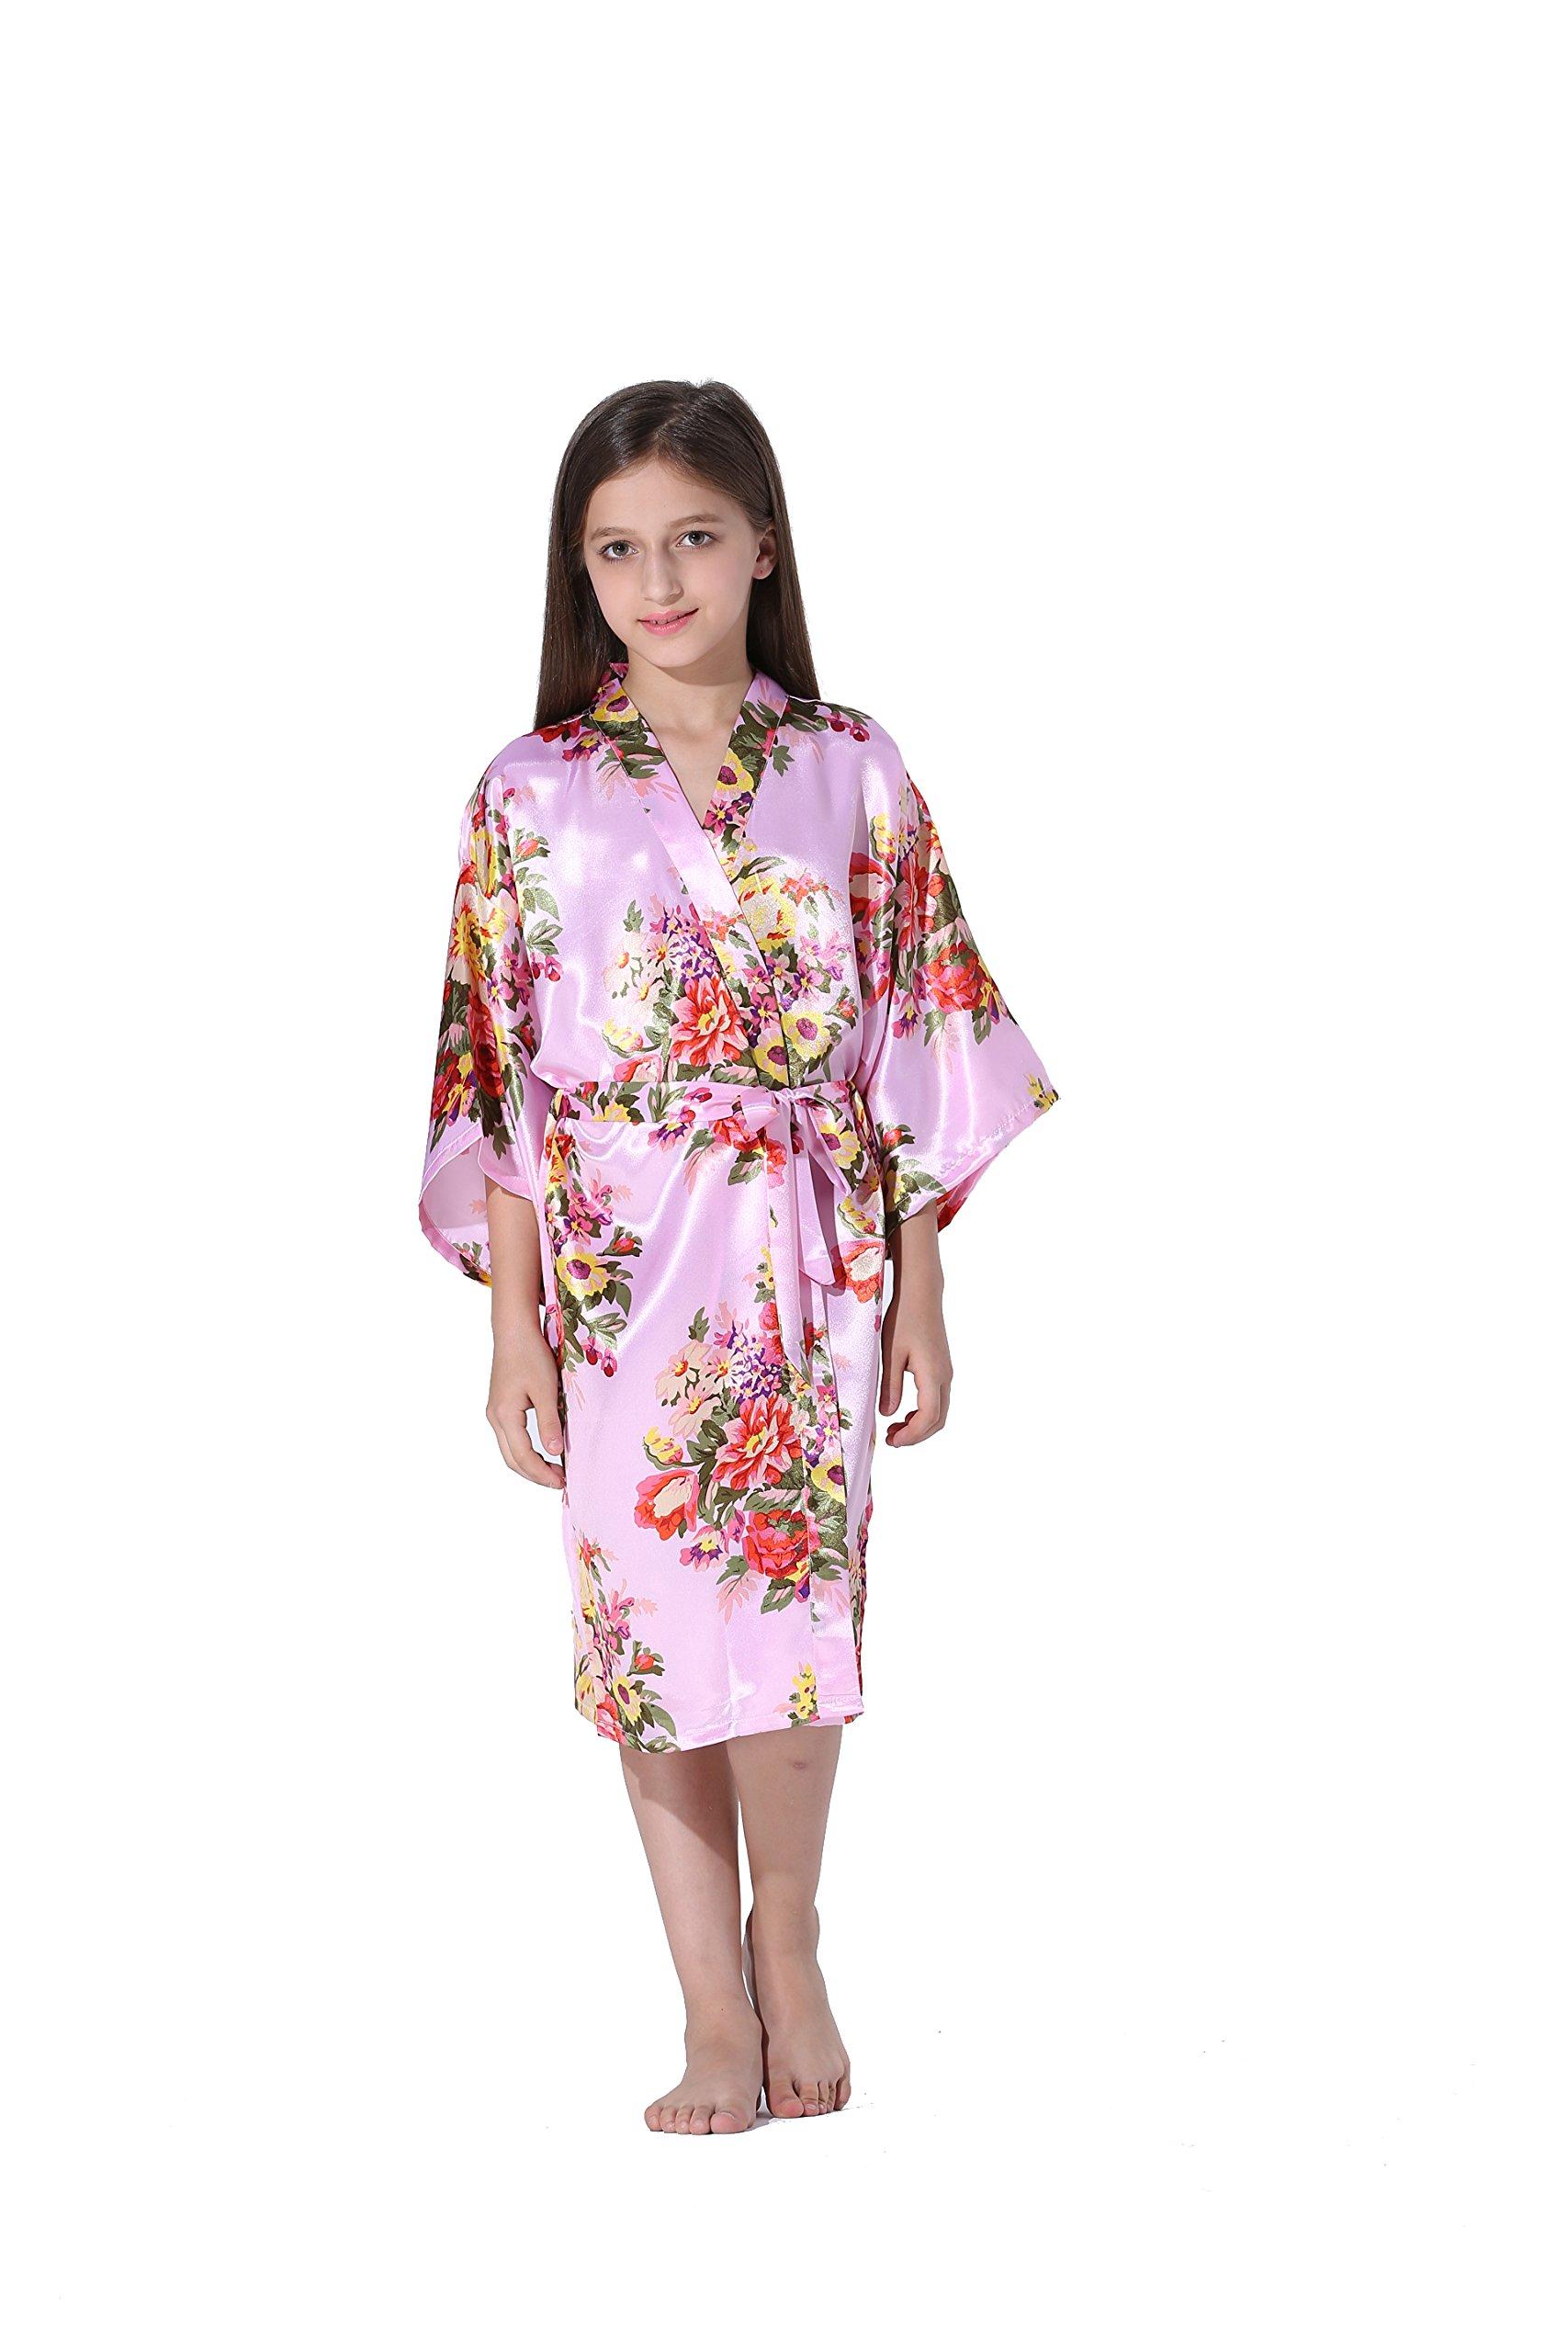 Vogue Forefront Girls' Floral Print Satin Kimono Robe Bathrobe, Size 8, Pink